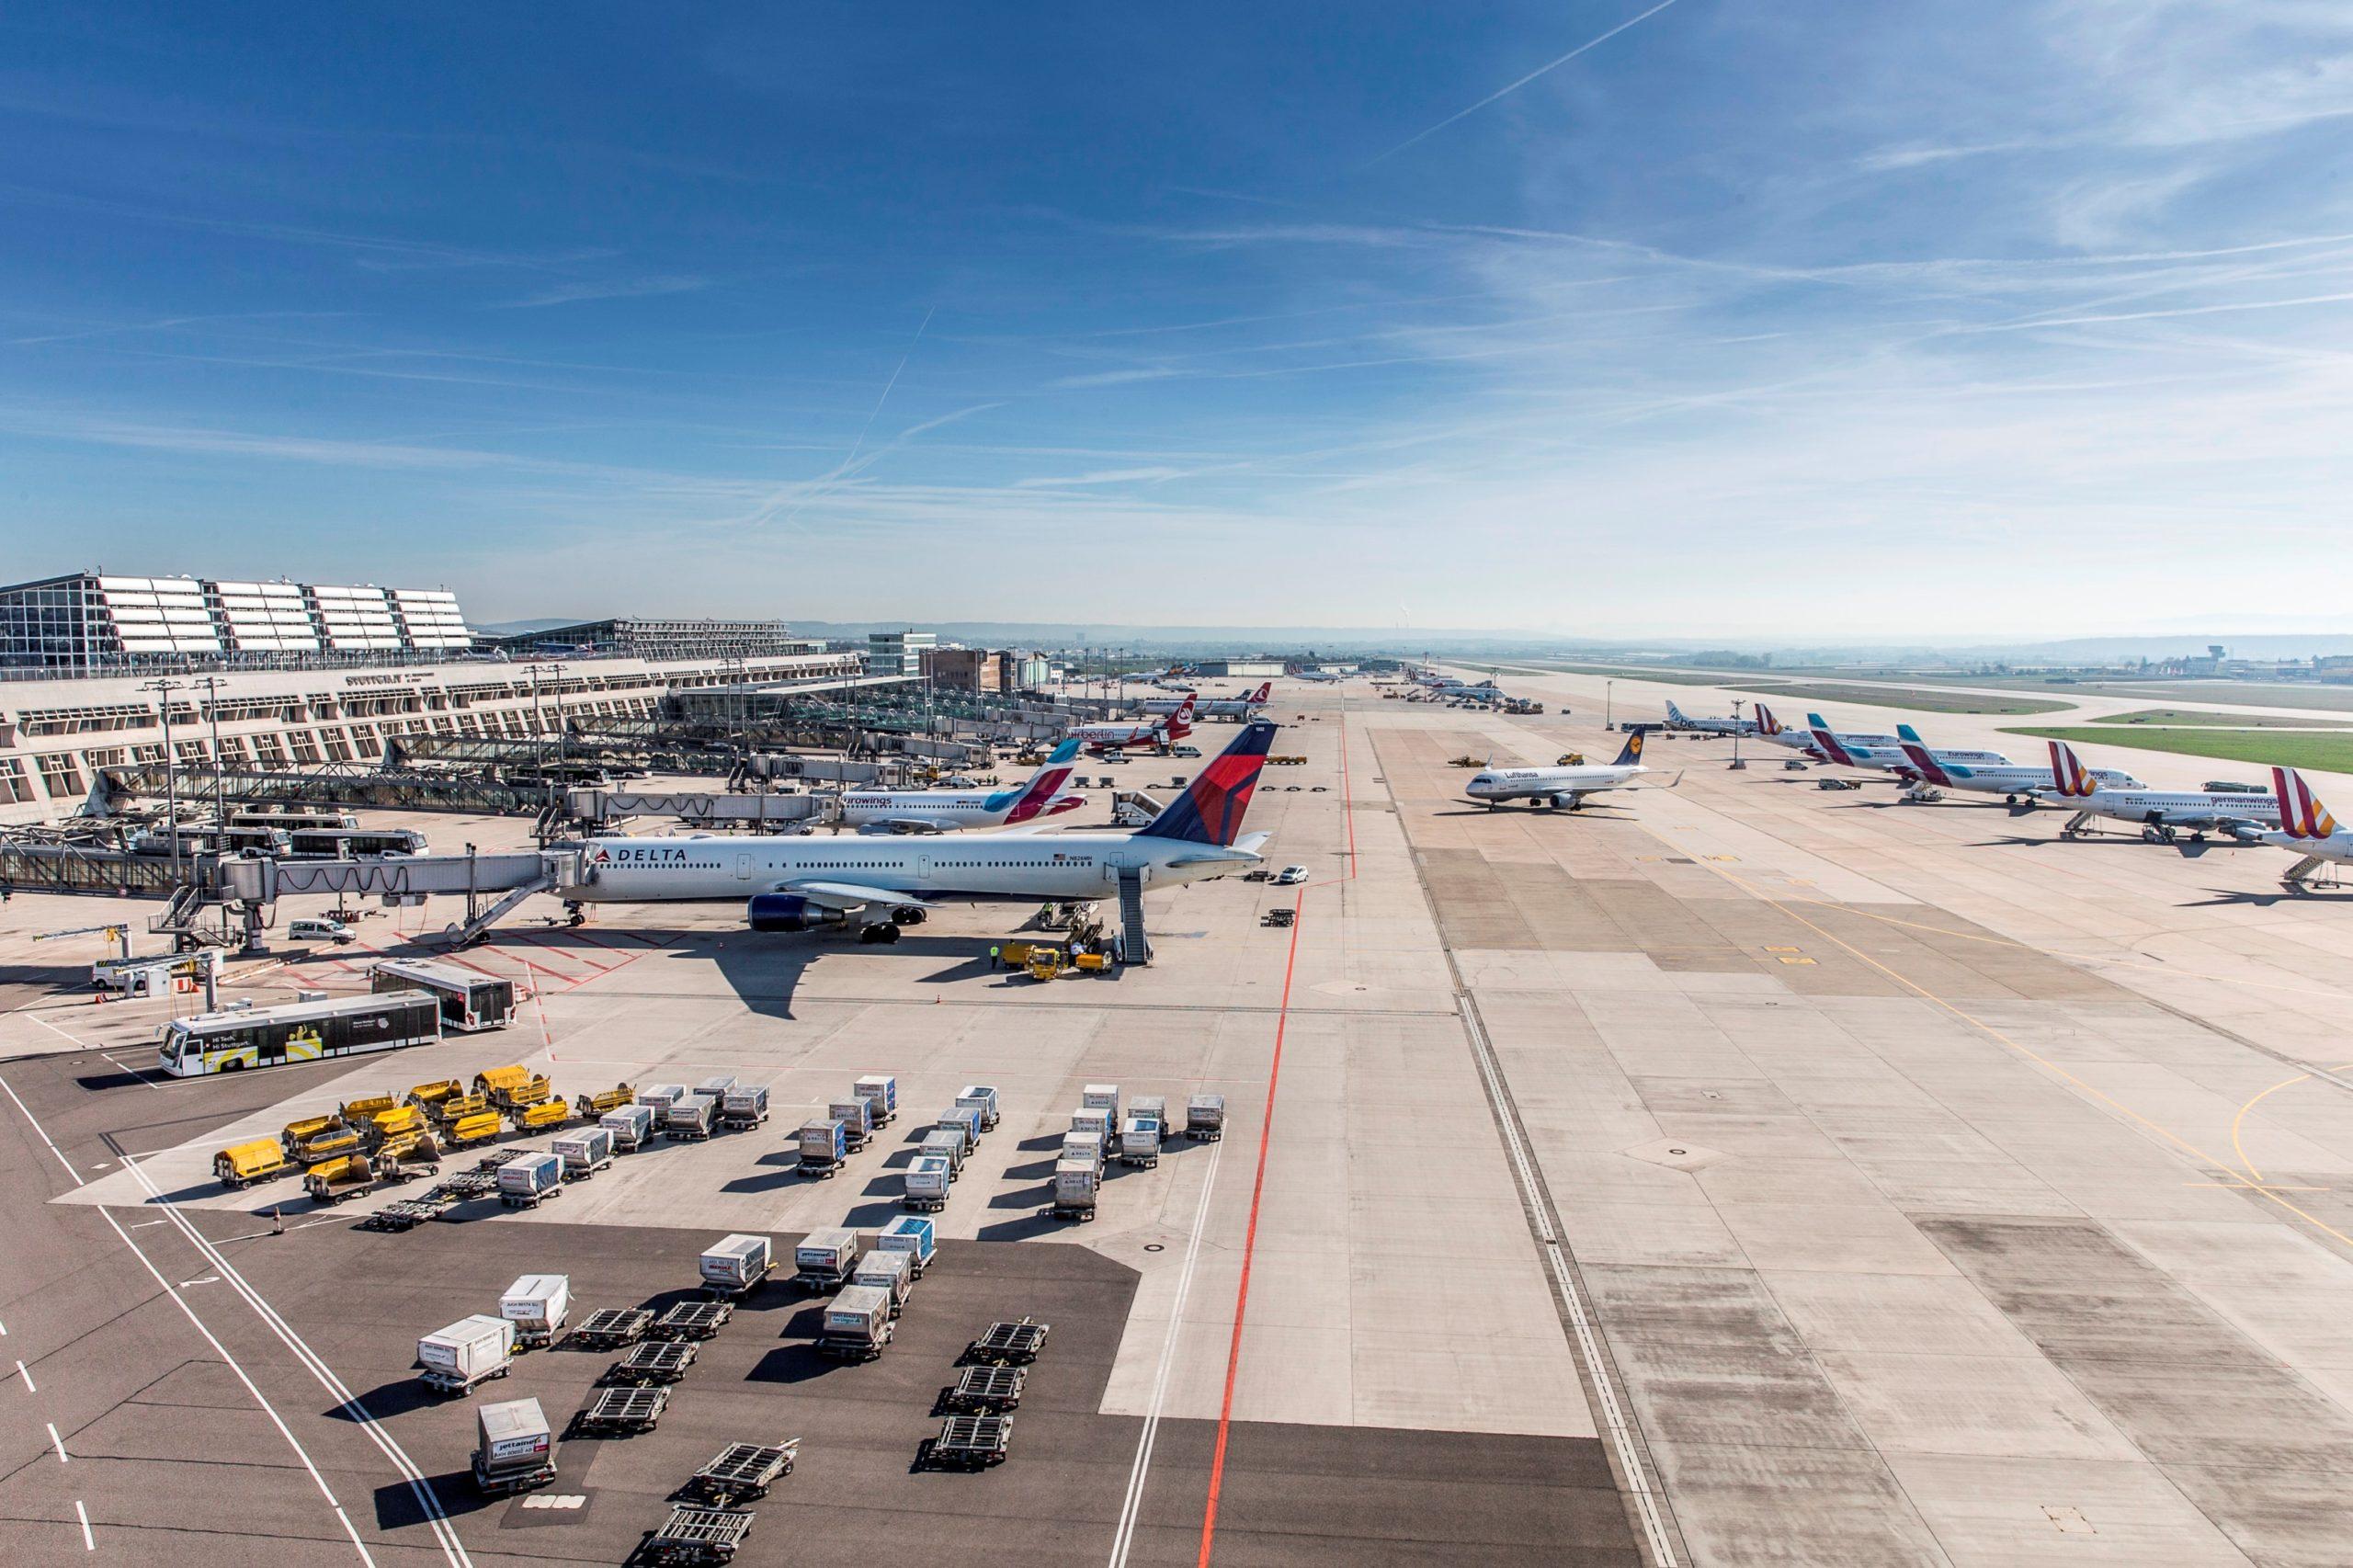 Stuttgart Airport halts flight operations from April 6 to April 22